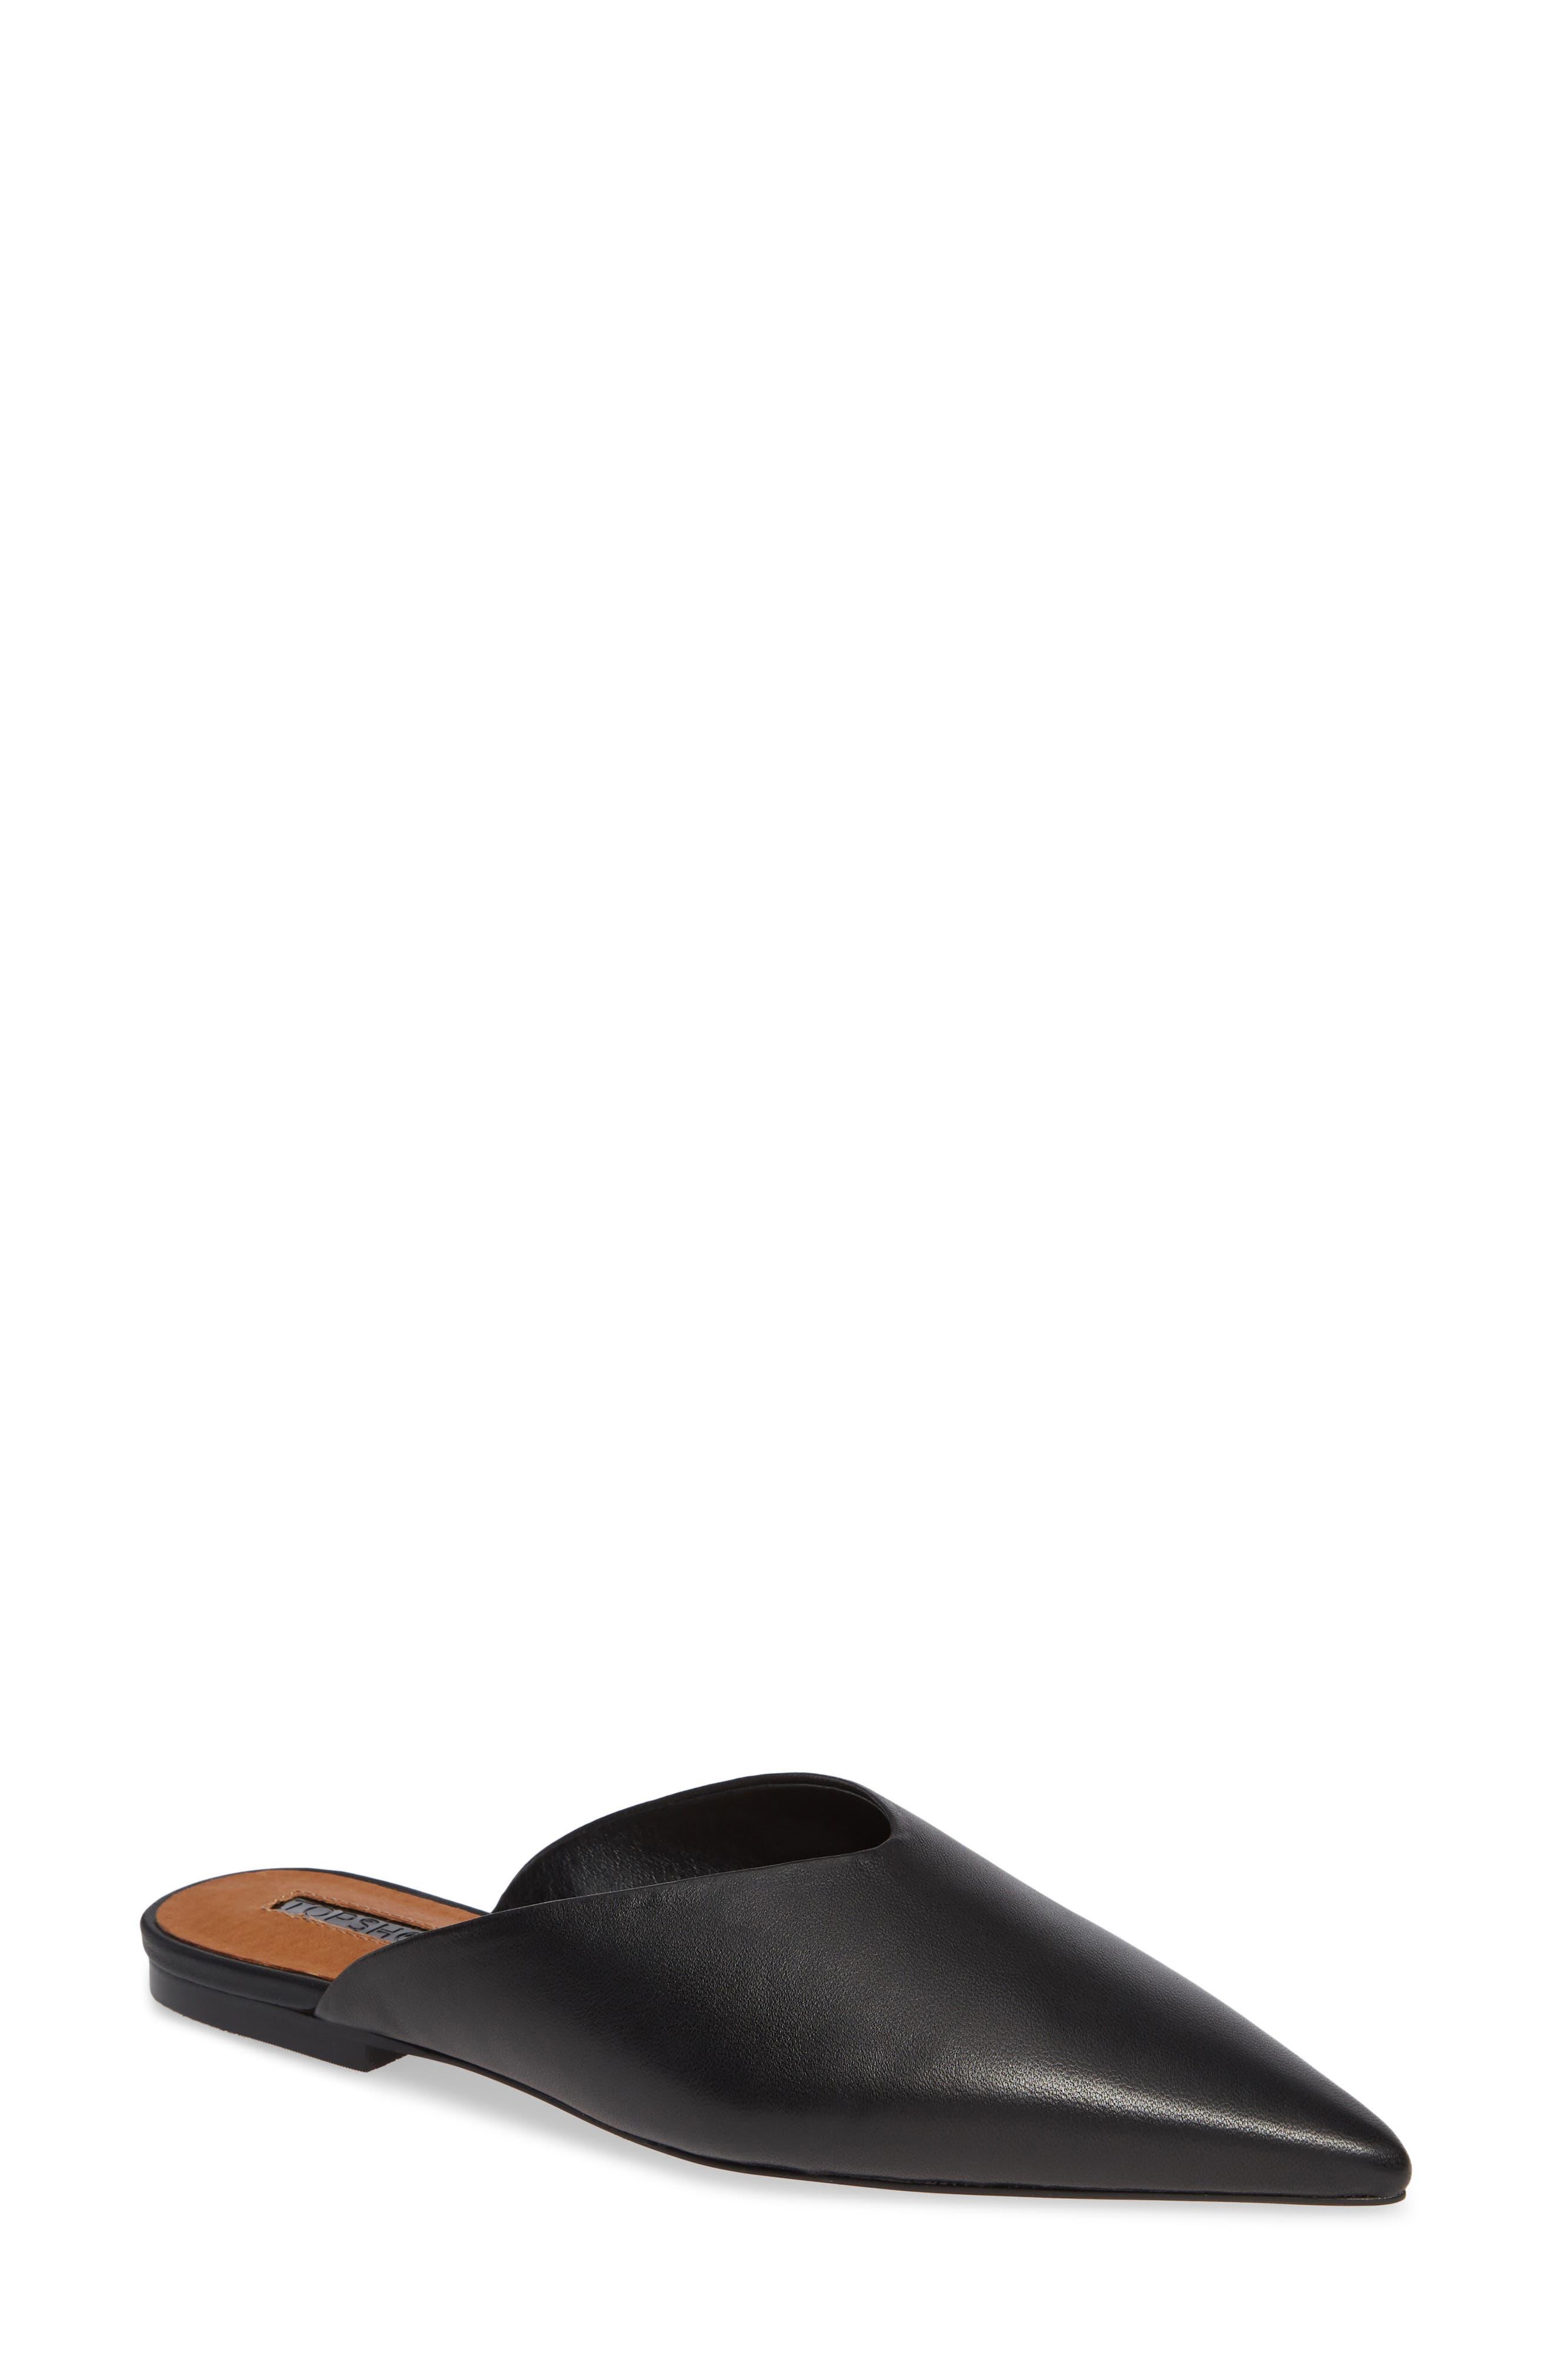 Kilo Pointy Toe Mule,                         Main,                         color, BLACK